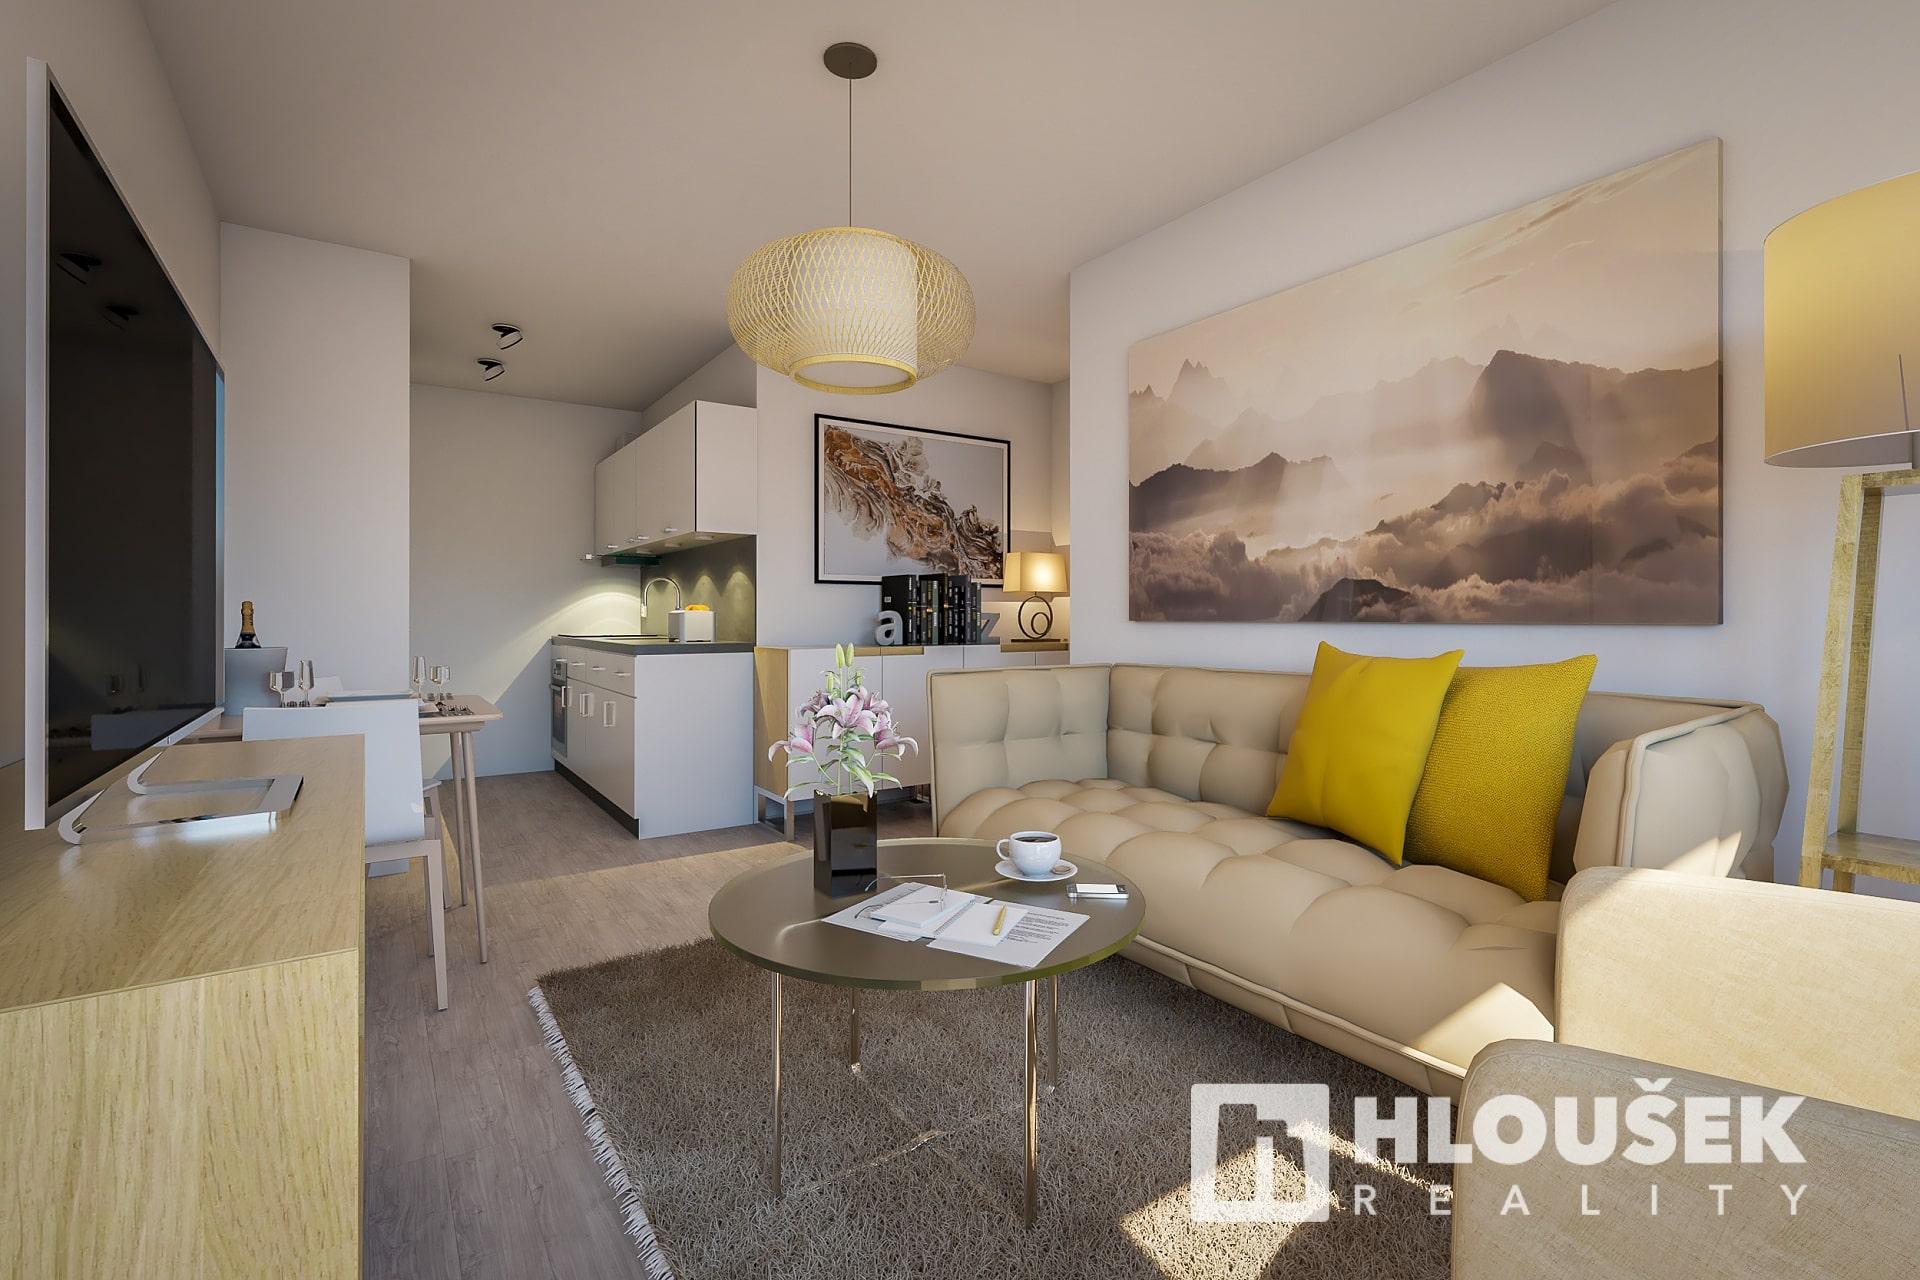 Prodej bytu Praha 4 - Chodov, ul. Tererova, vizualizace